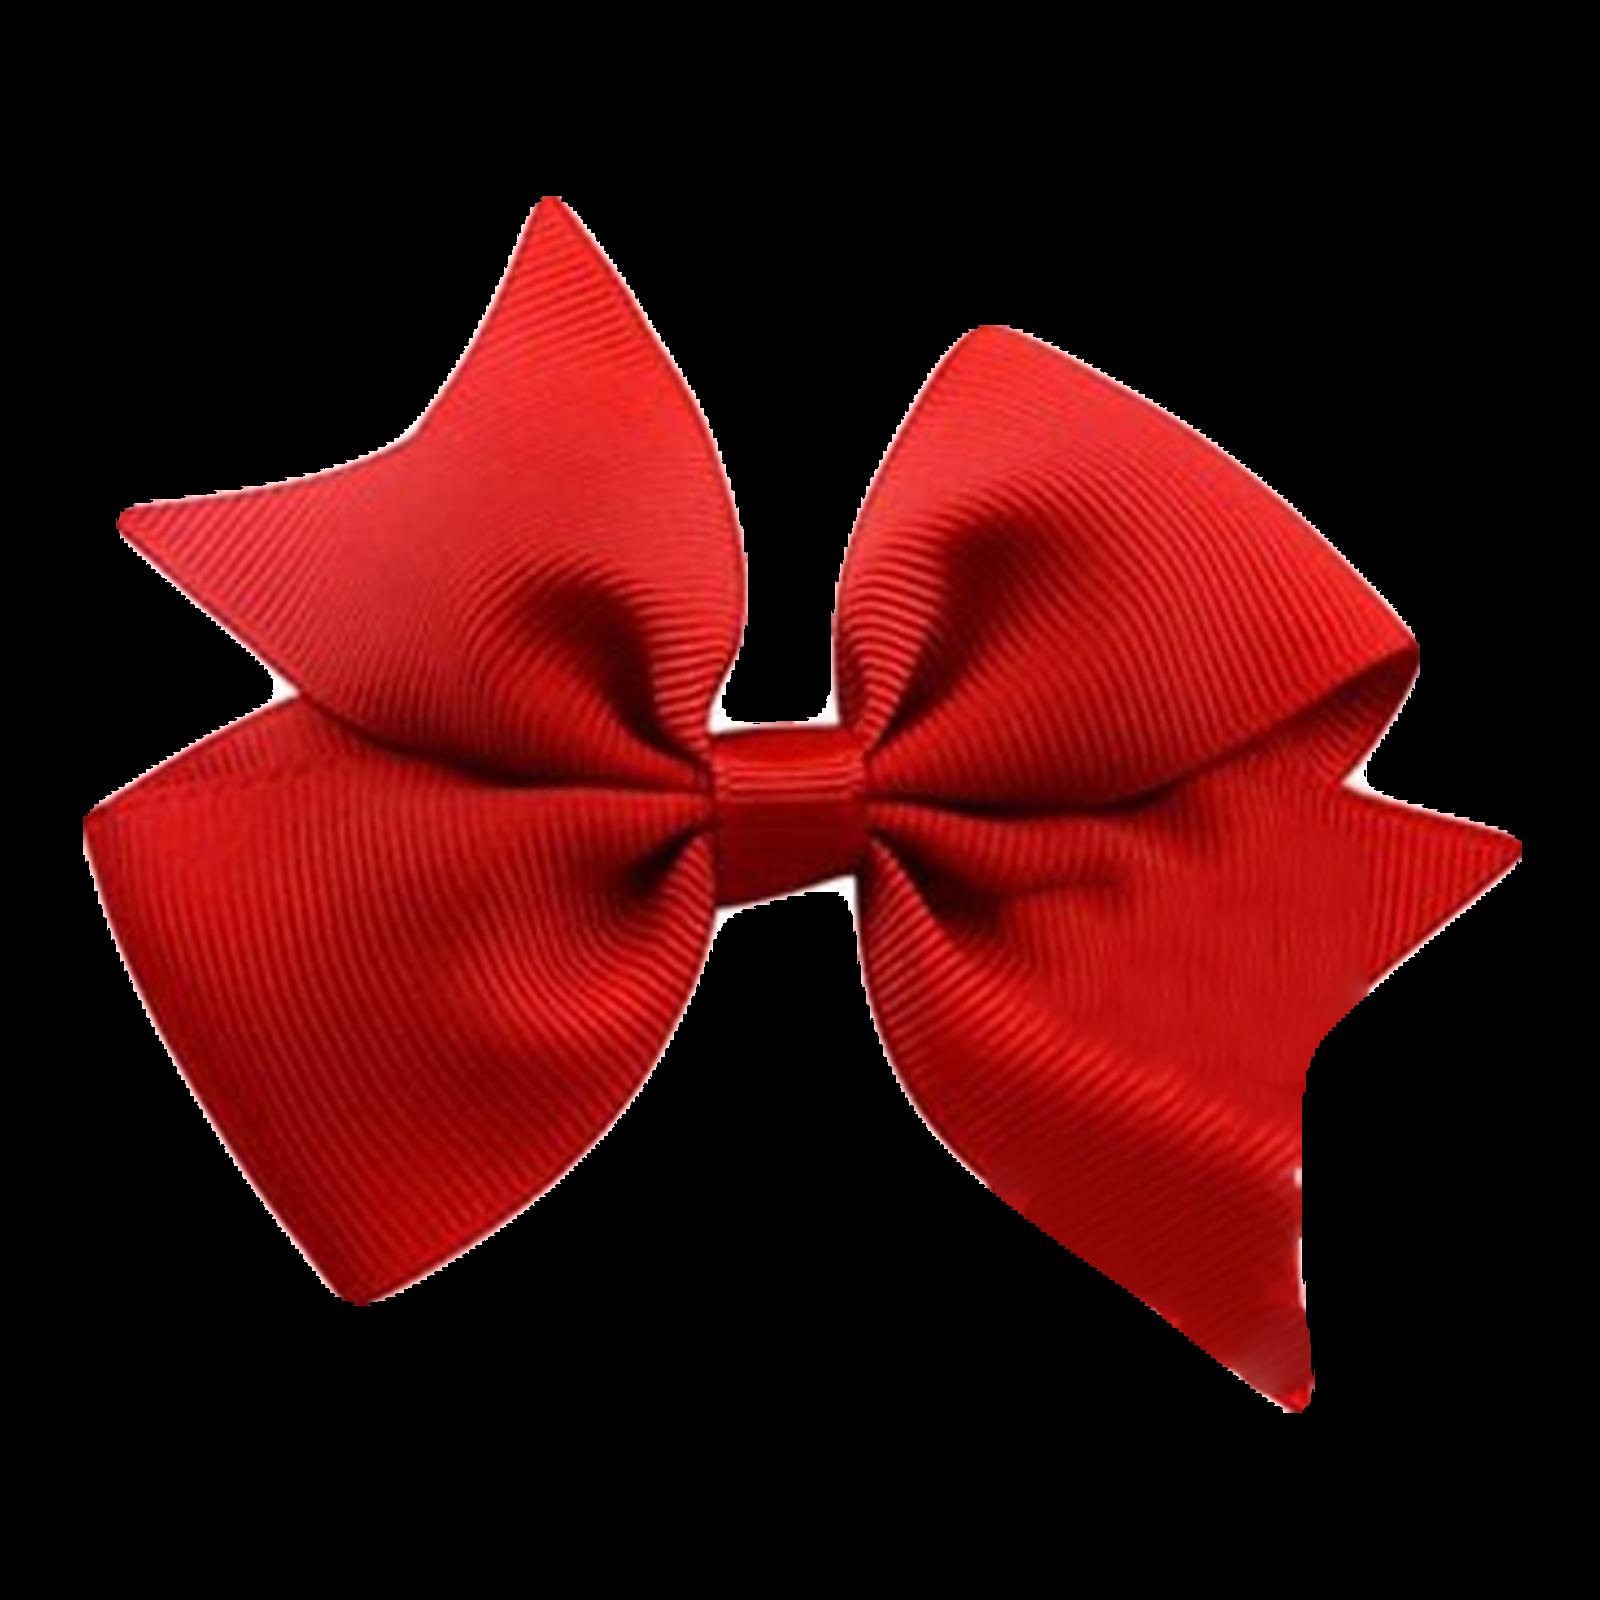 Virkotiecherry Hair Bow Virkotie Www Virkotie Com Hair Bows Bows Red